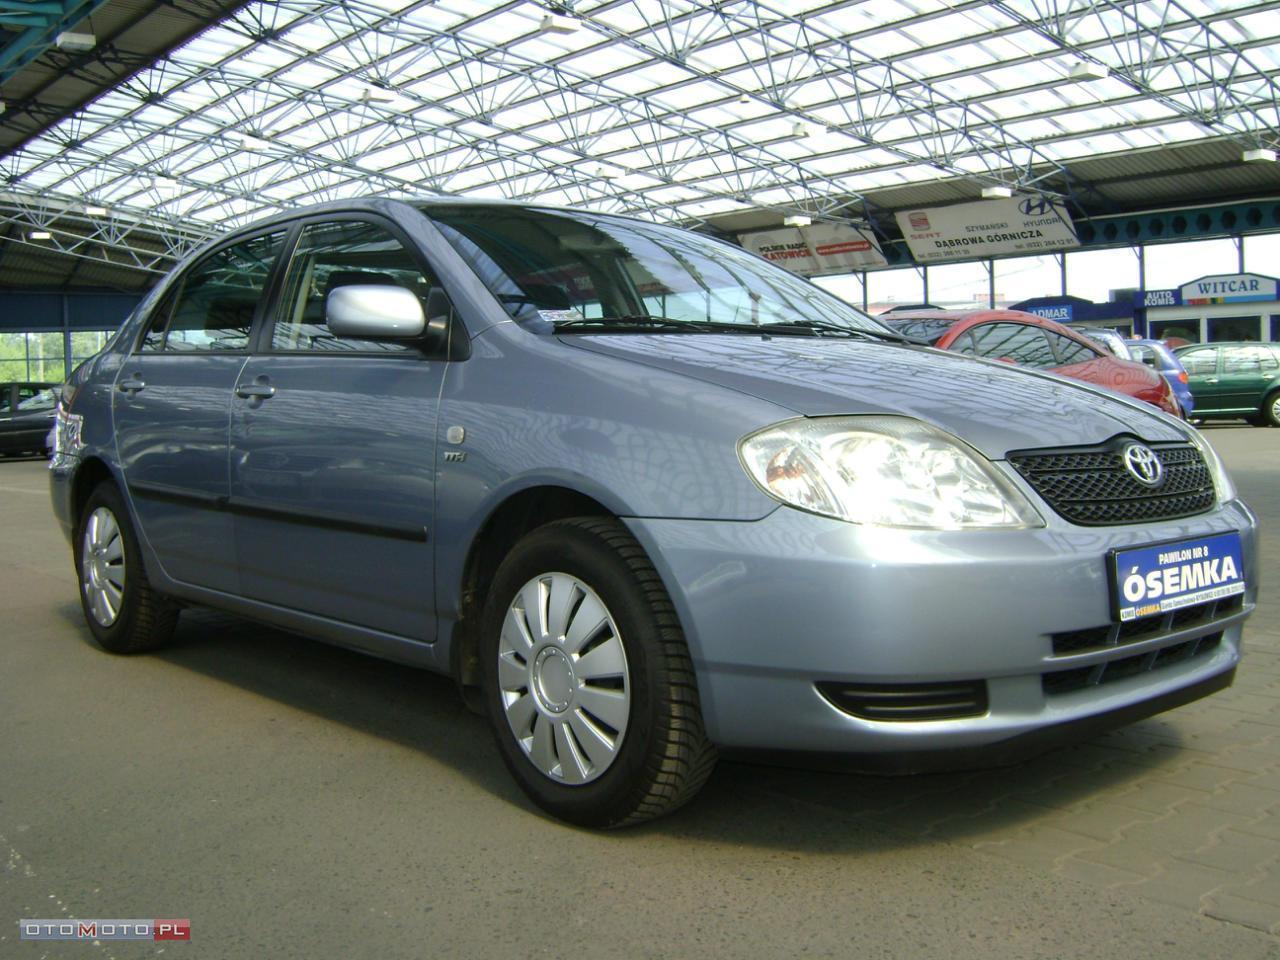 Toyota Corolla 1.6 VVTi,SALONOWA,SERWISOWANA